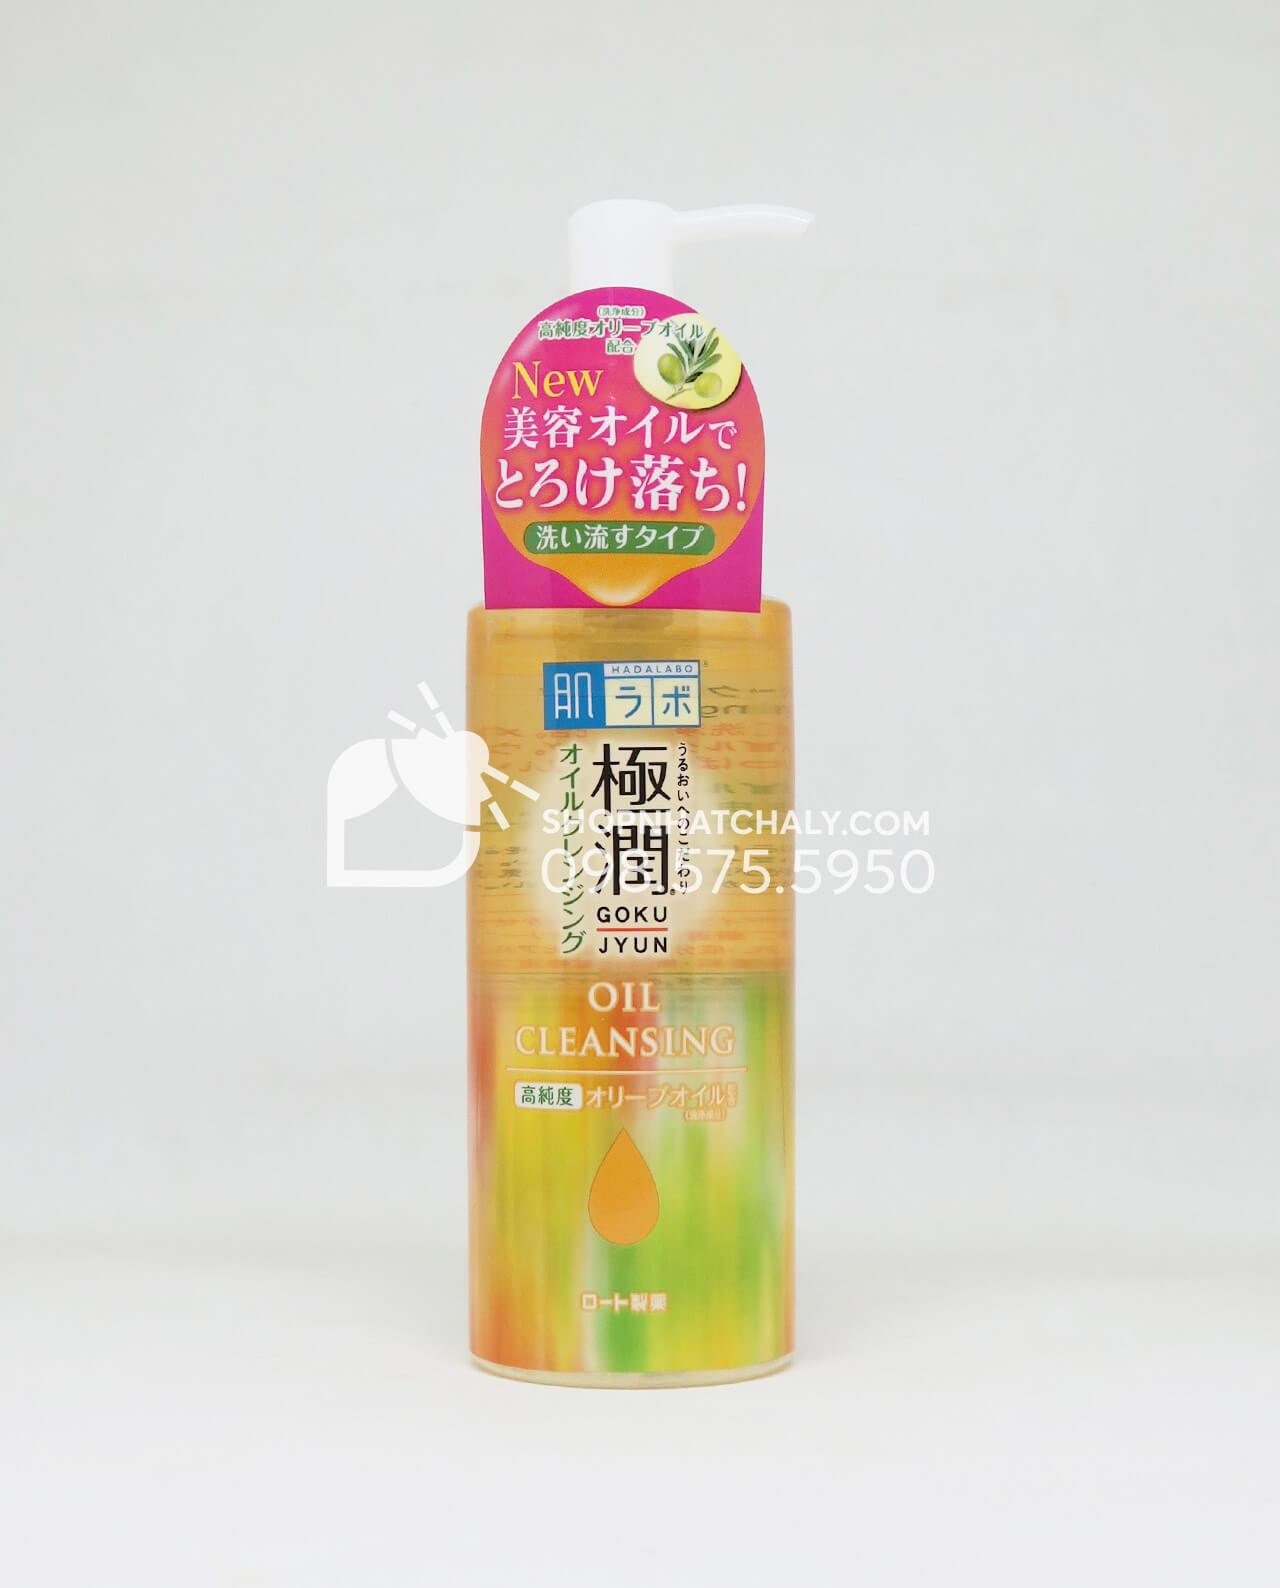 Dầu tẩy trang Hada Labo Gokujyun Cleansing Oil 200ml